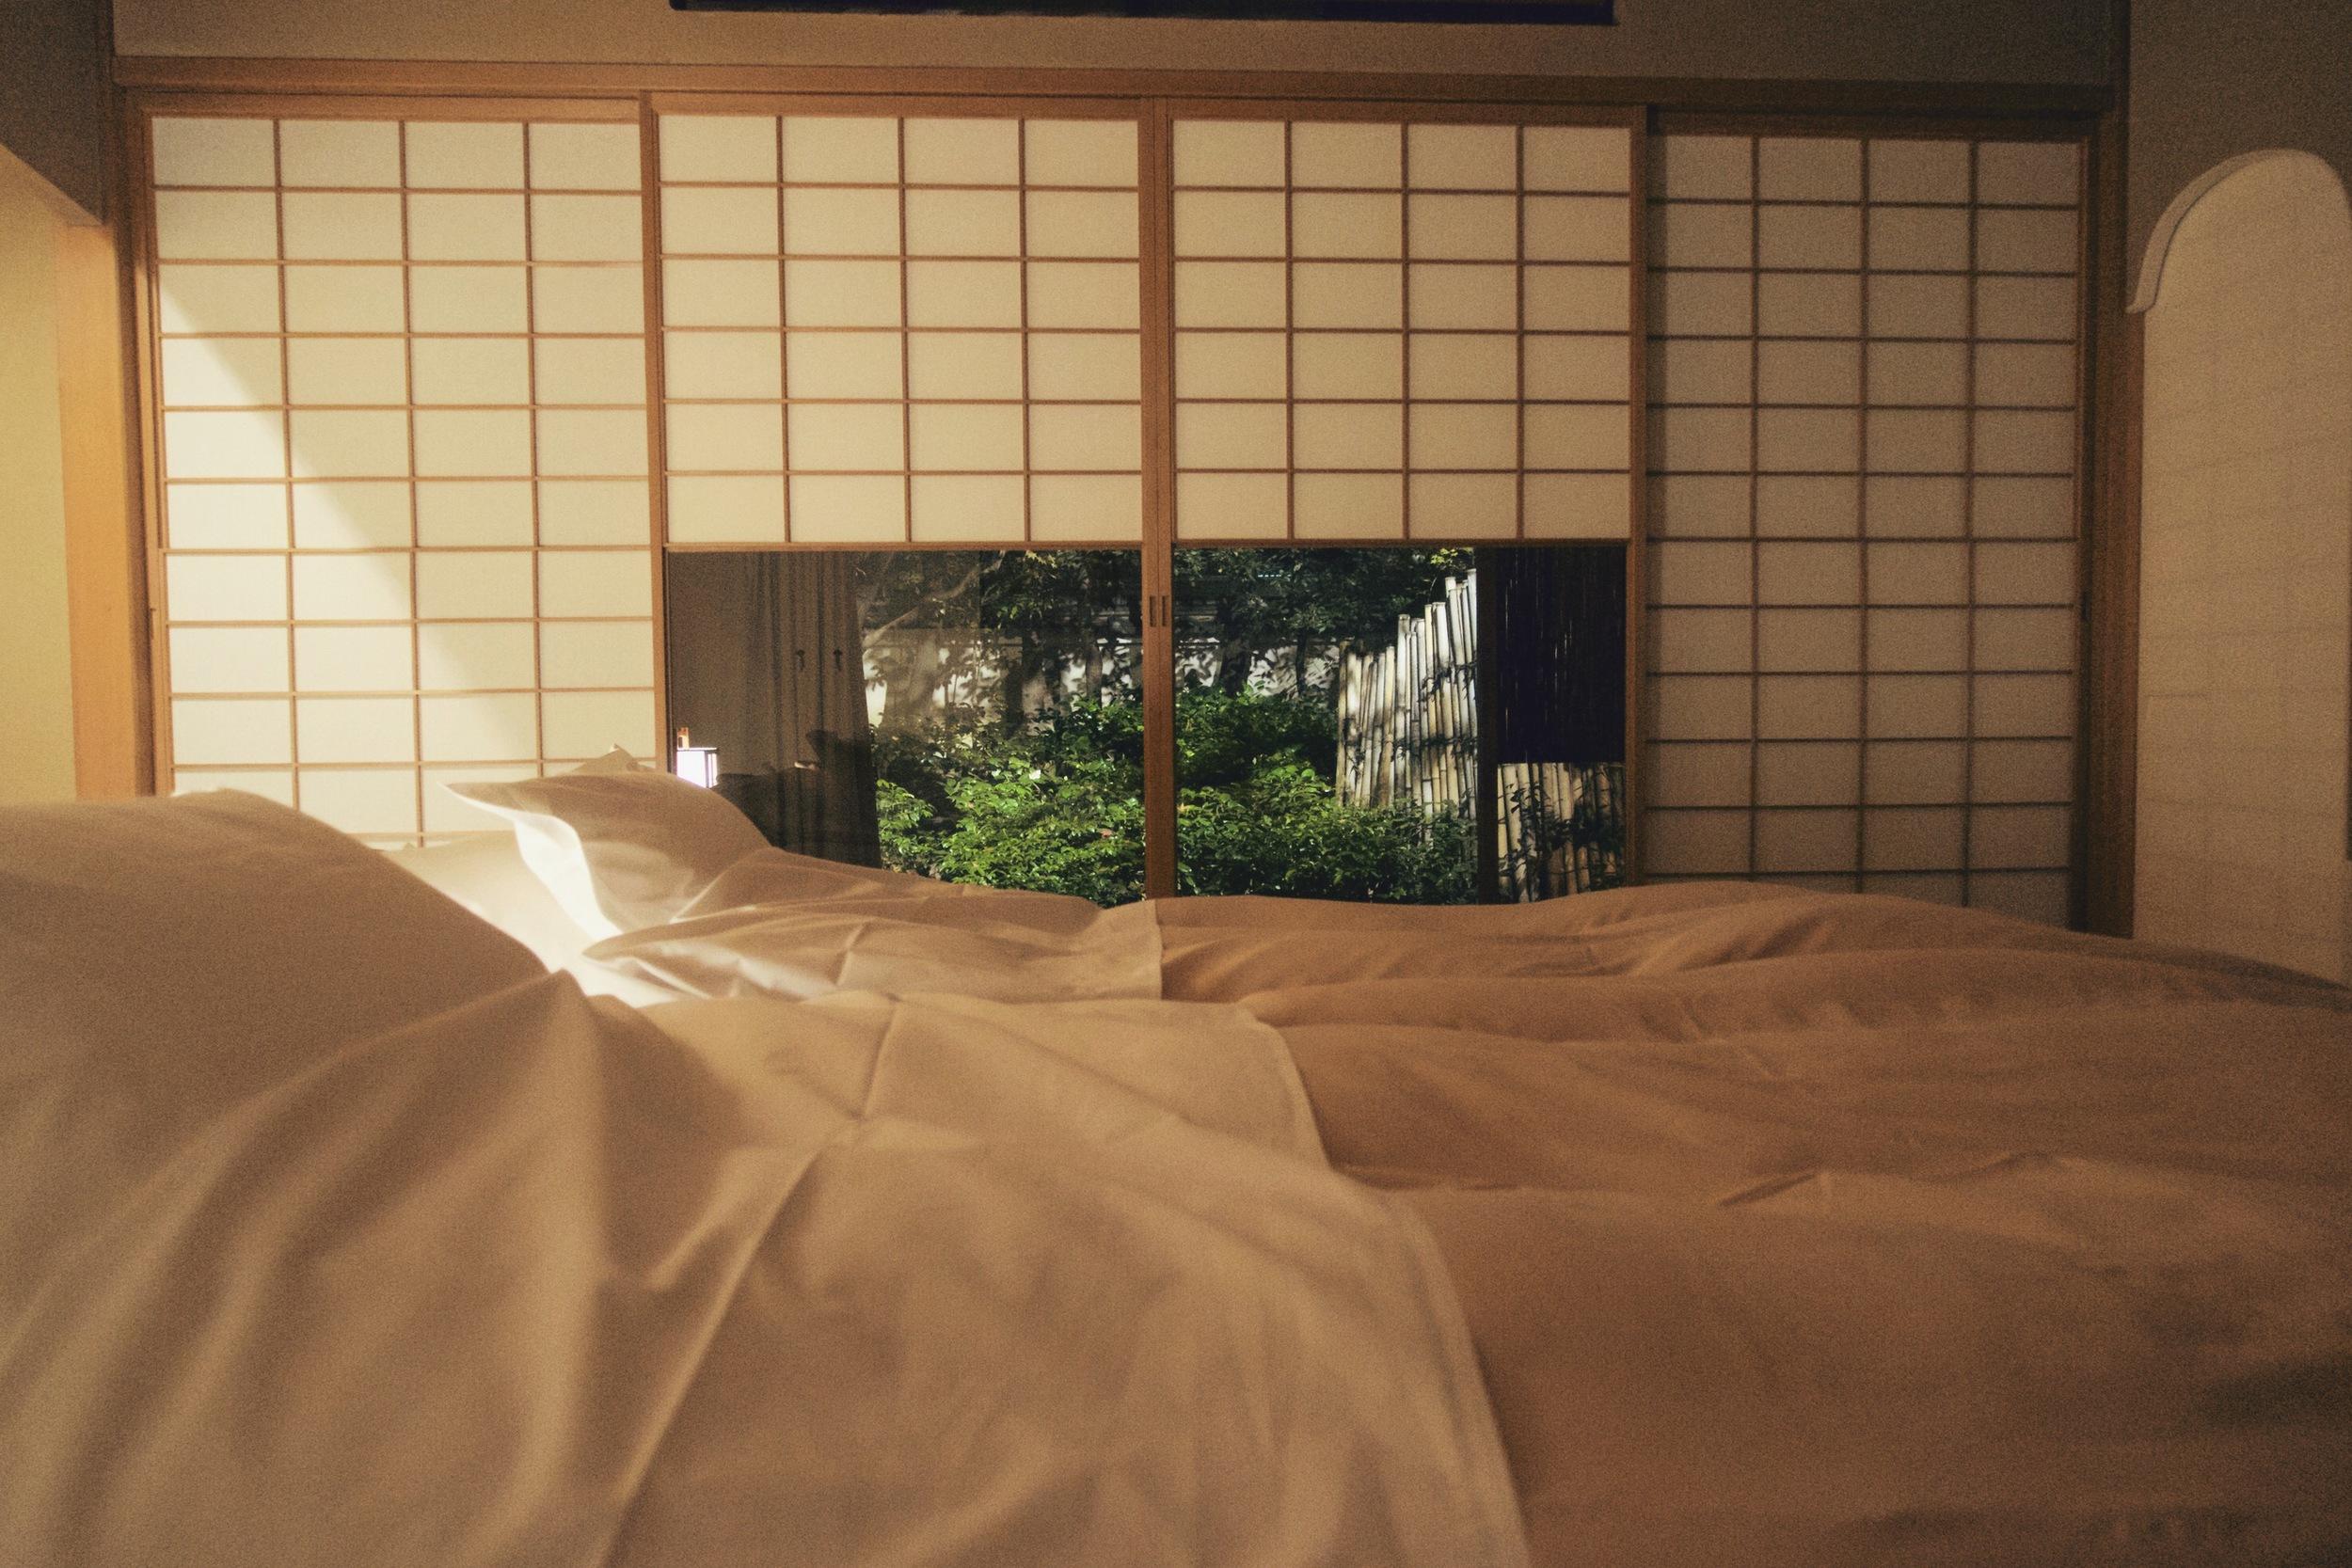 The ryokan experience